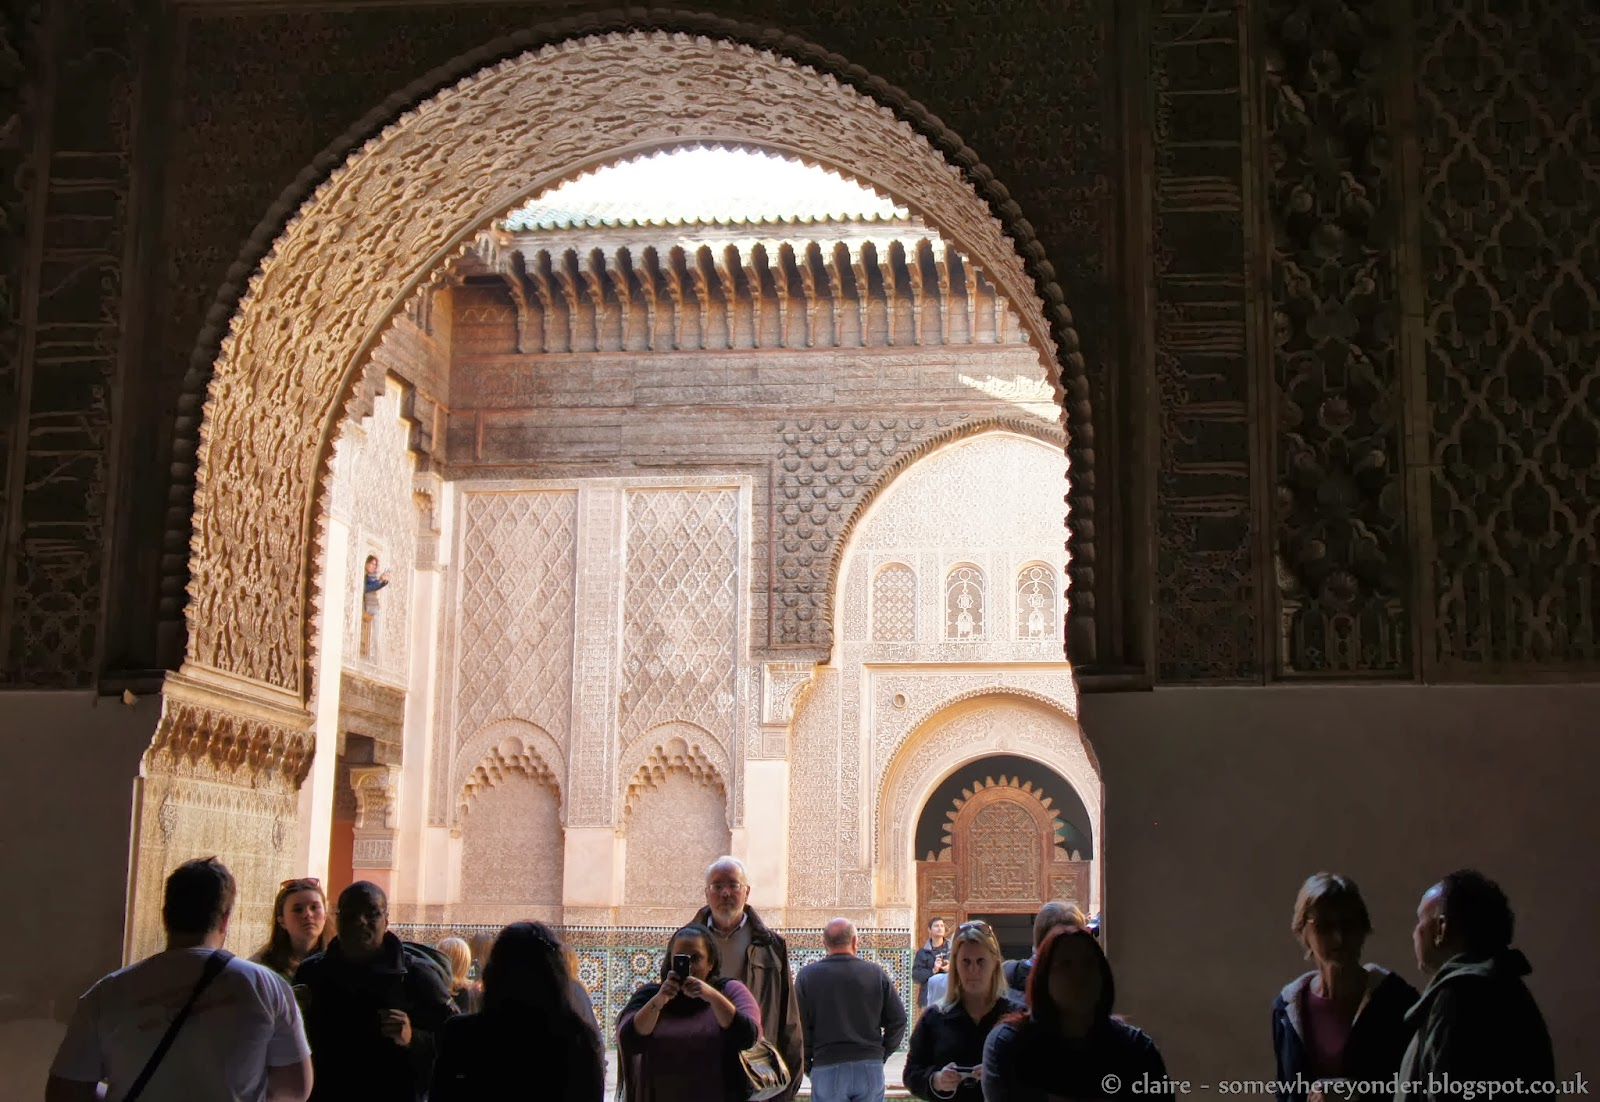 Tourists at Ben Youssef Madrasa, Marrakech